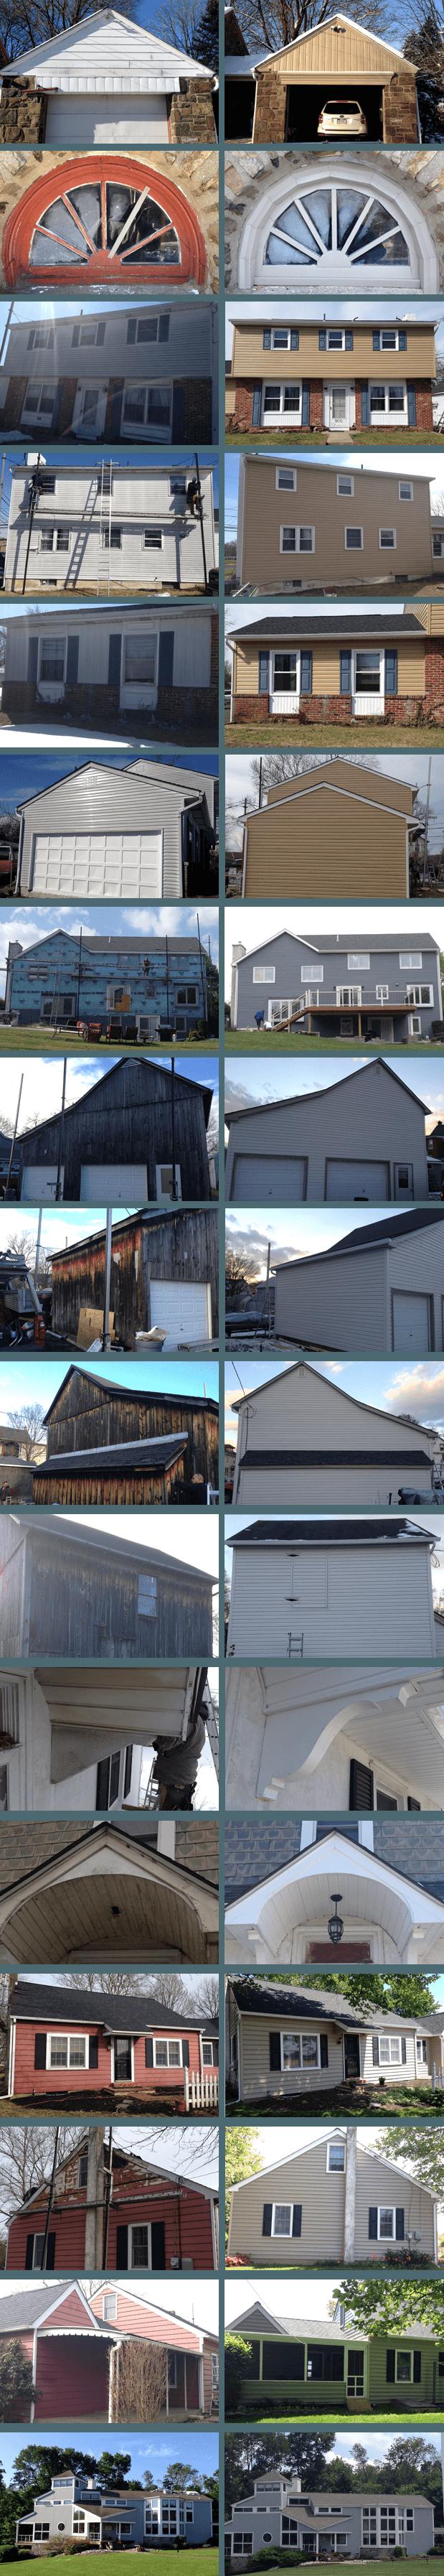 Roofing   | Upper Black Eddy, PA | Timothy Schaffer Roofing Siding & Windows | 610-847-0132